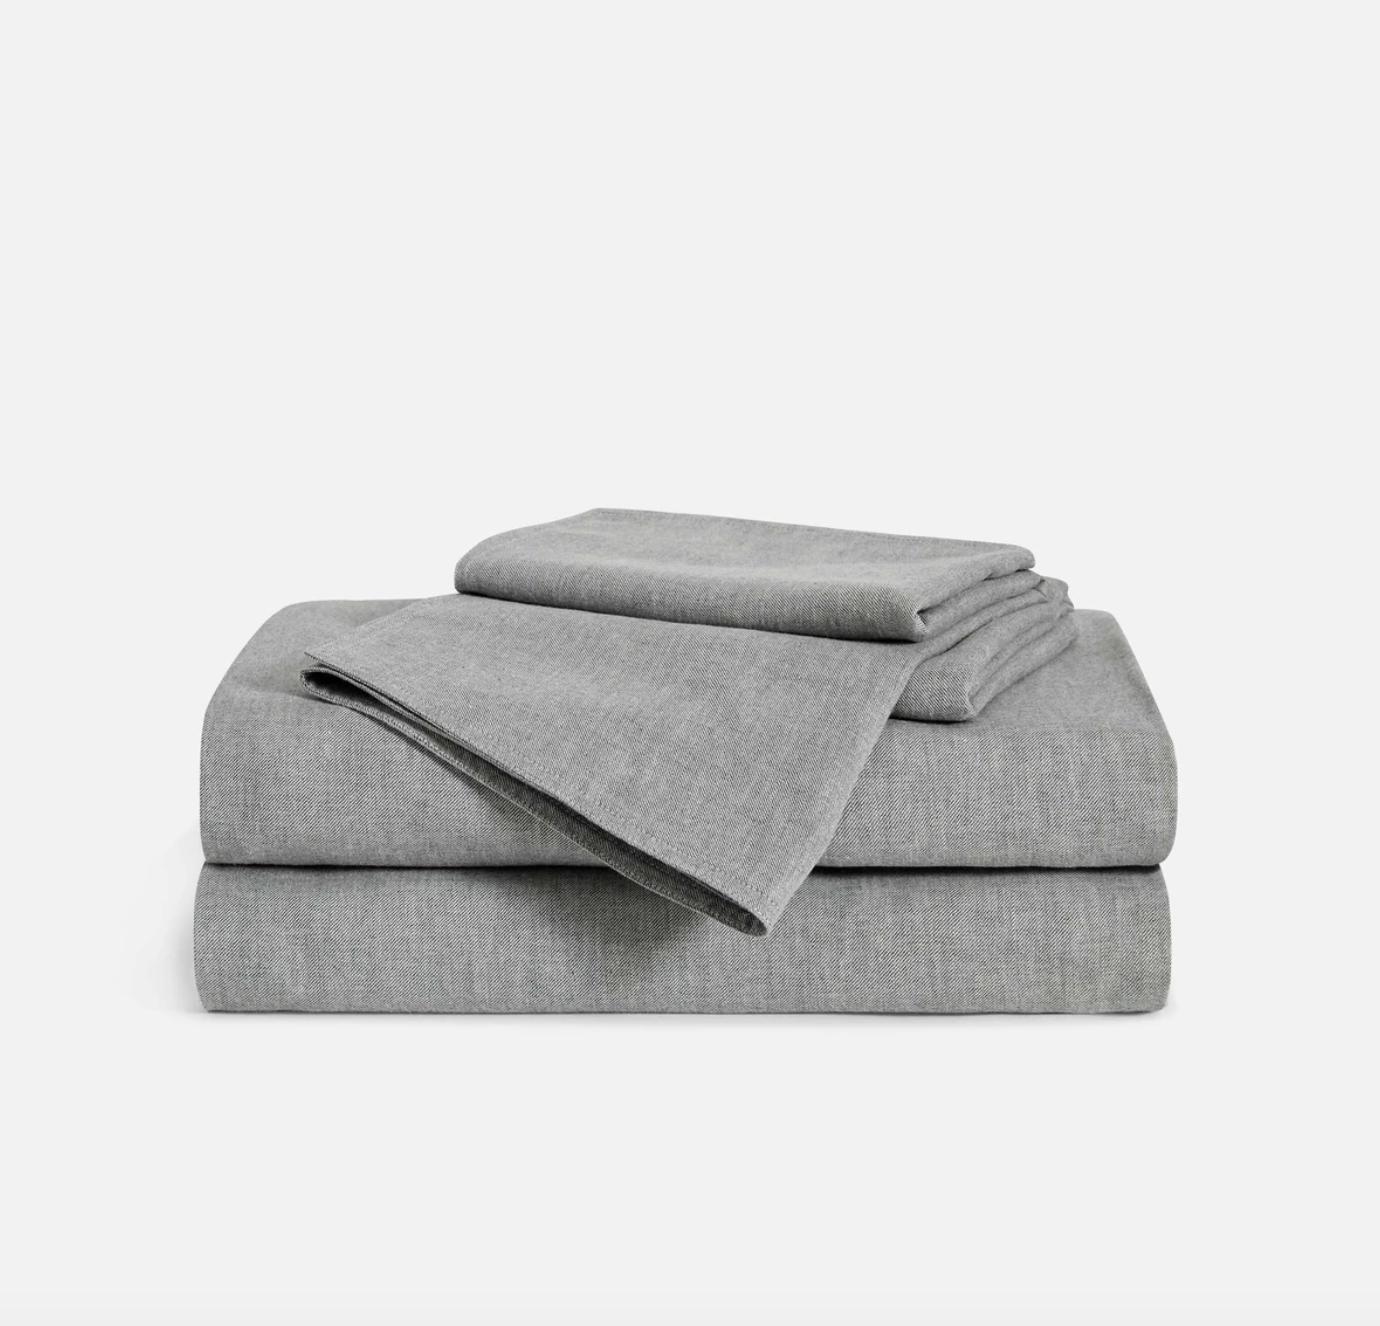 cashmere sheets